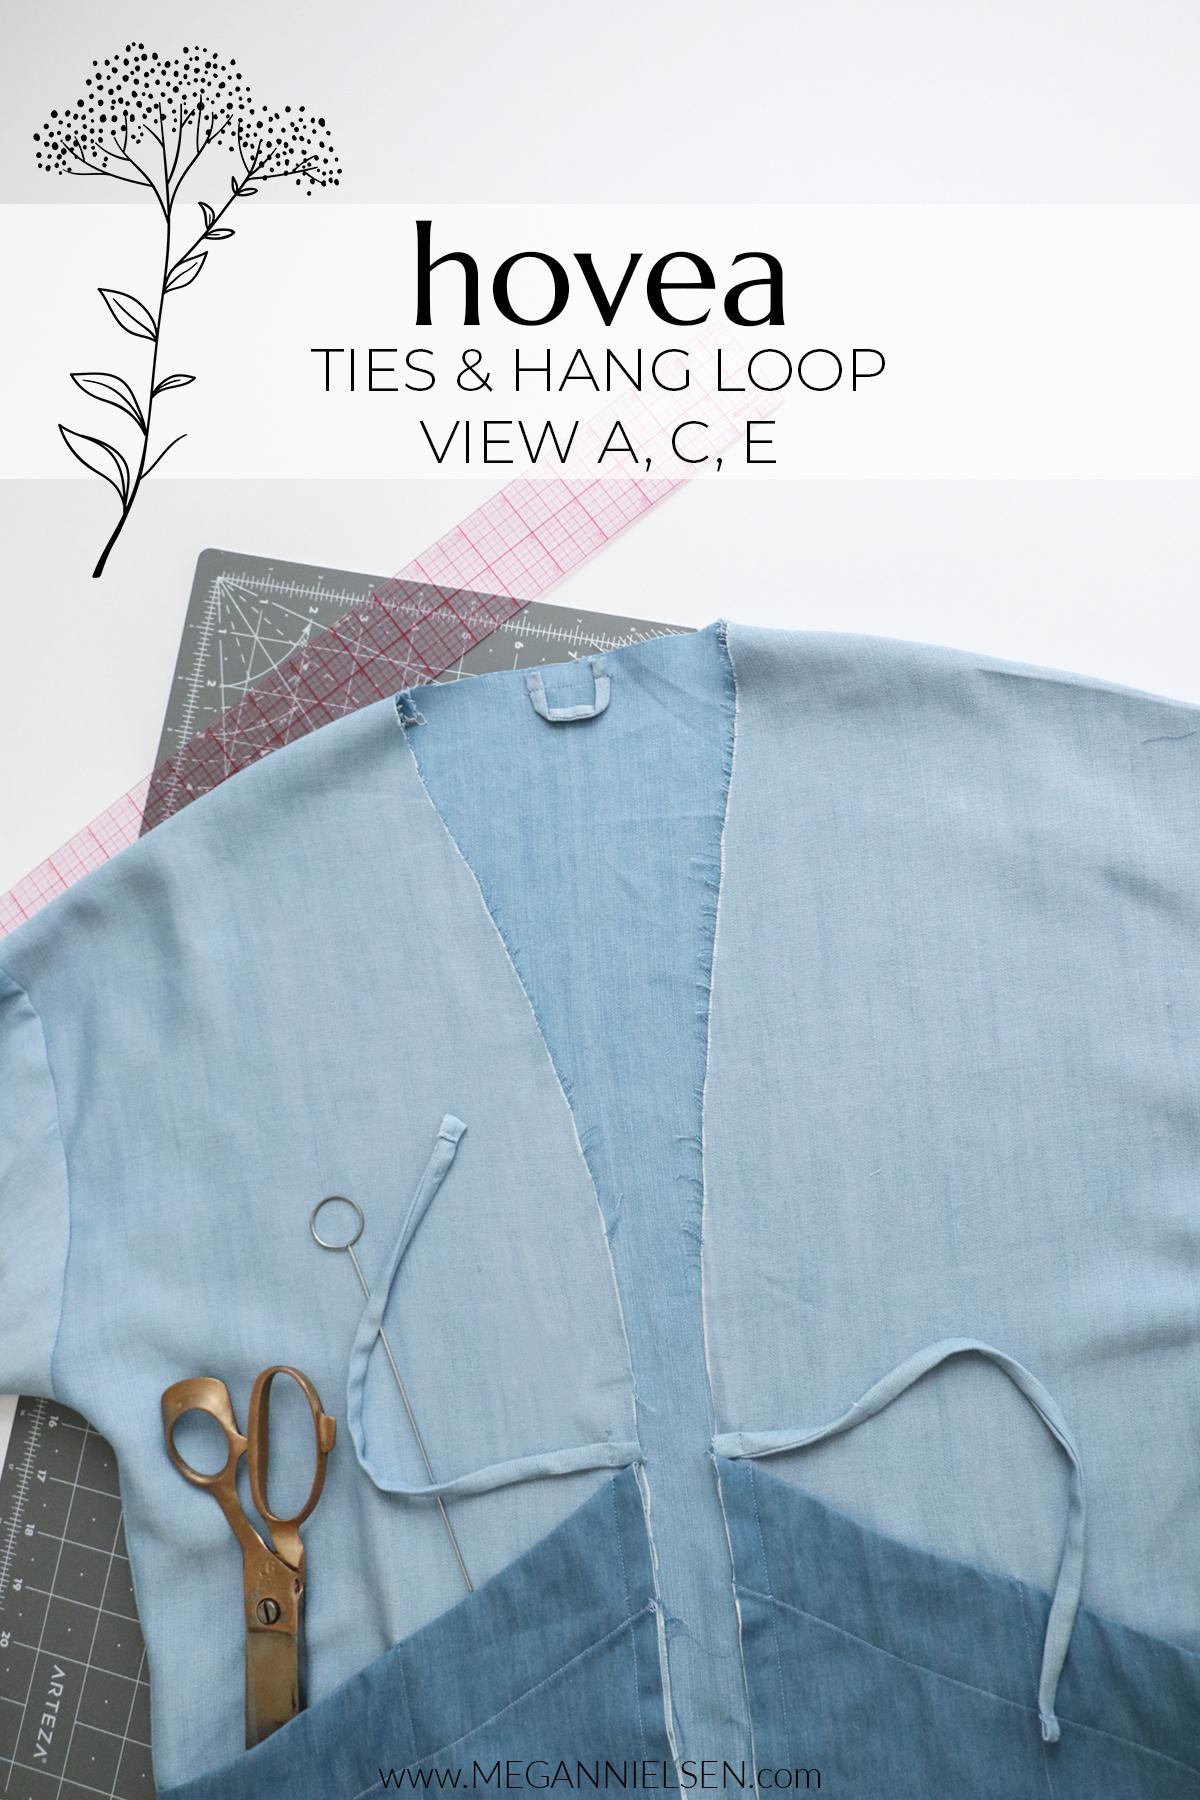 Hovea View A, C & E Ties & Hang Loop